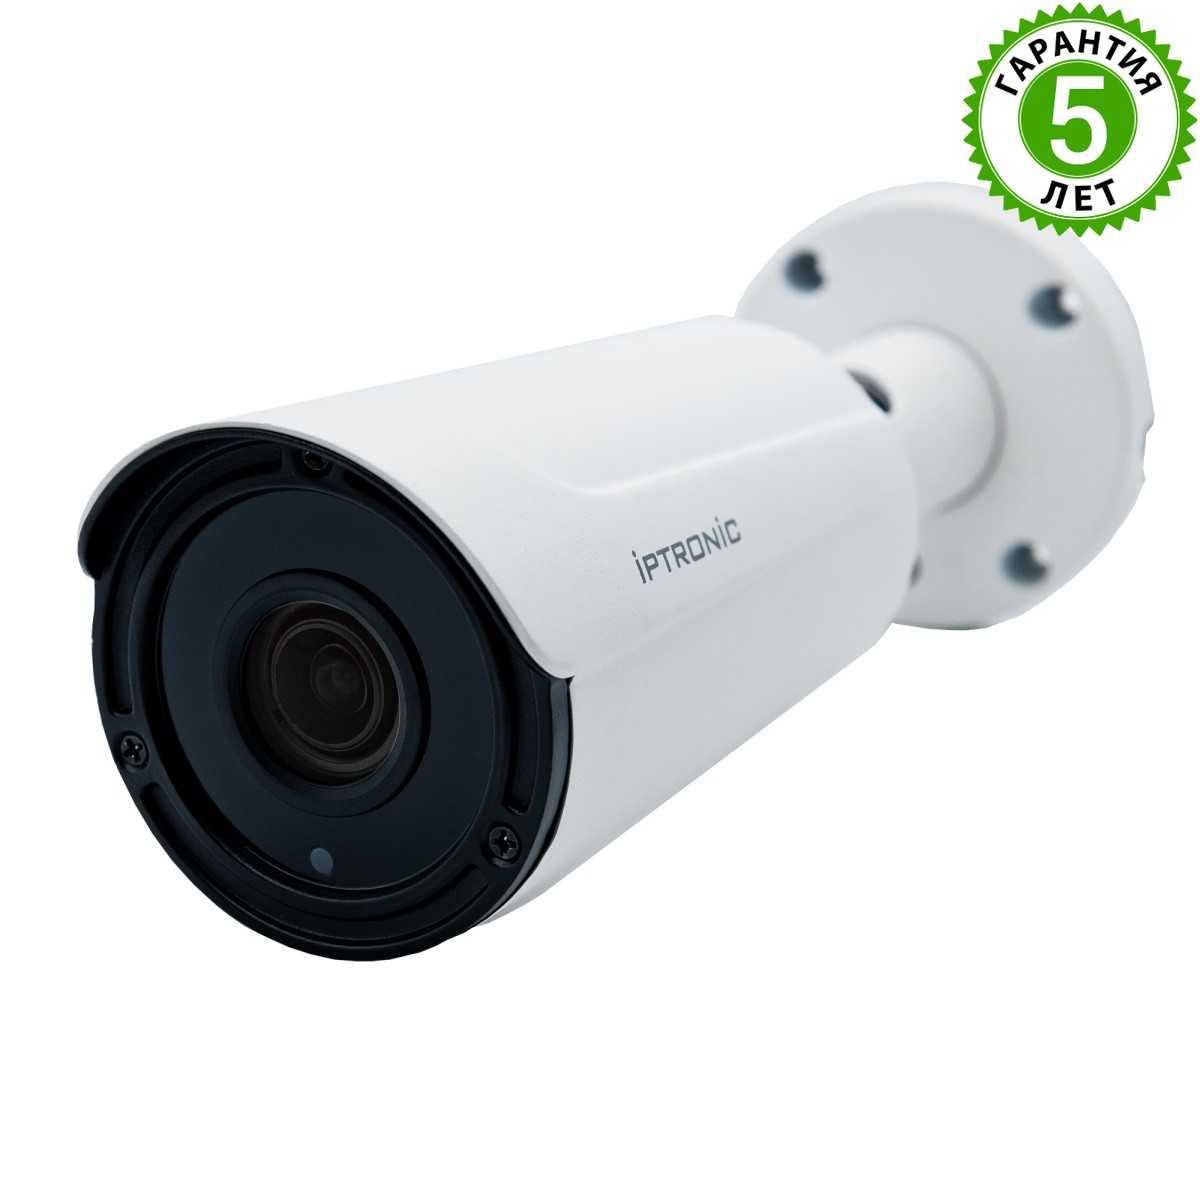 Видеокамера IPTRONIC IPT-QHD1080BMA(2,7-13,5)